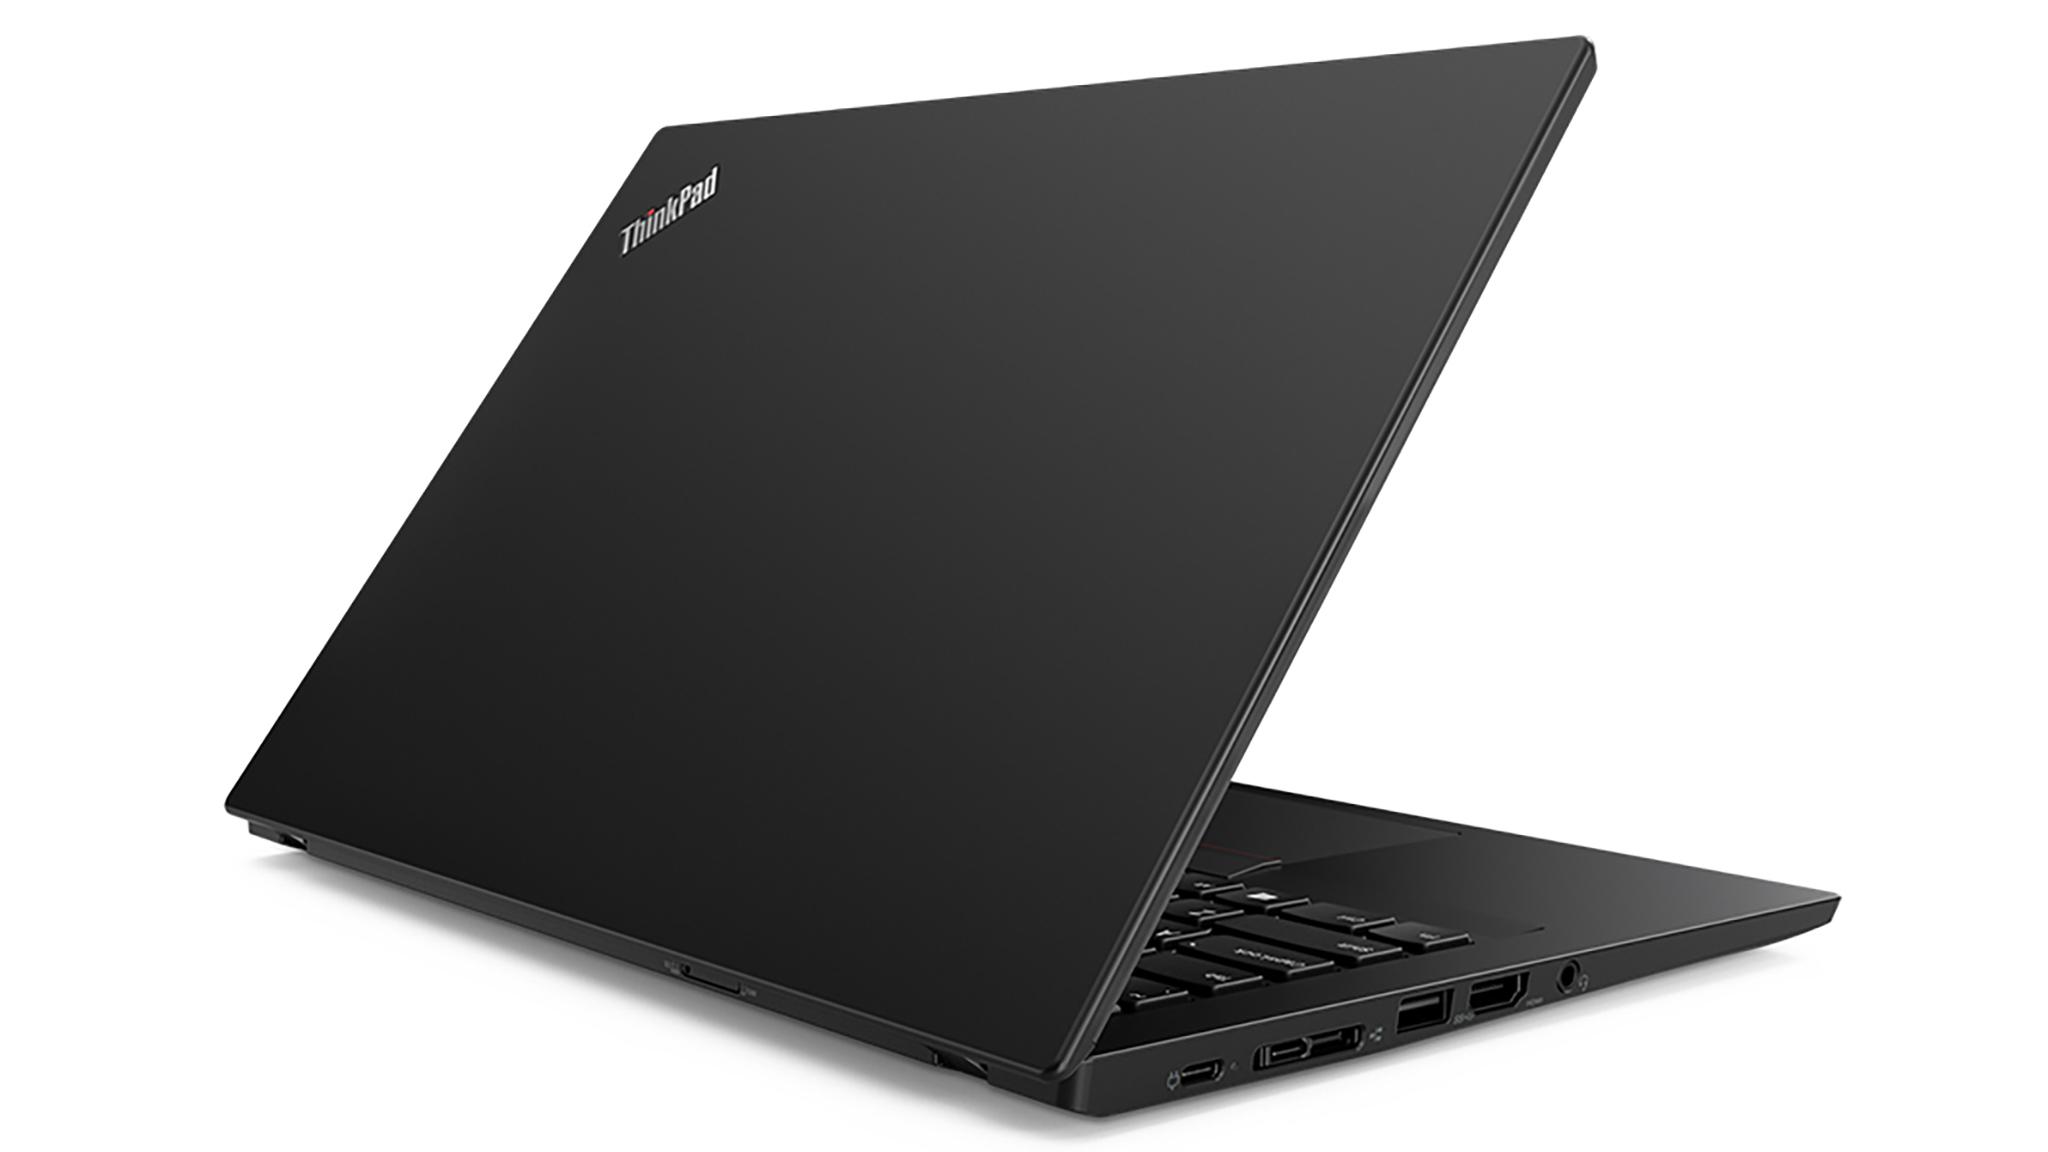 ThinkPad A285 (3).jpg